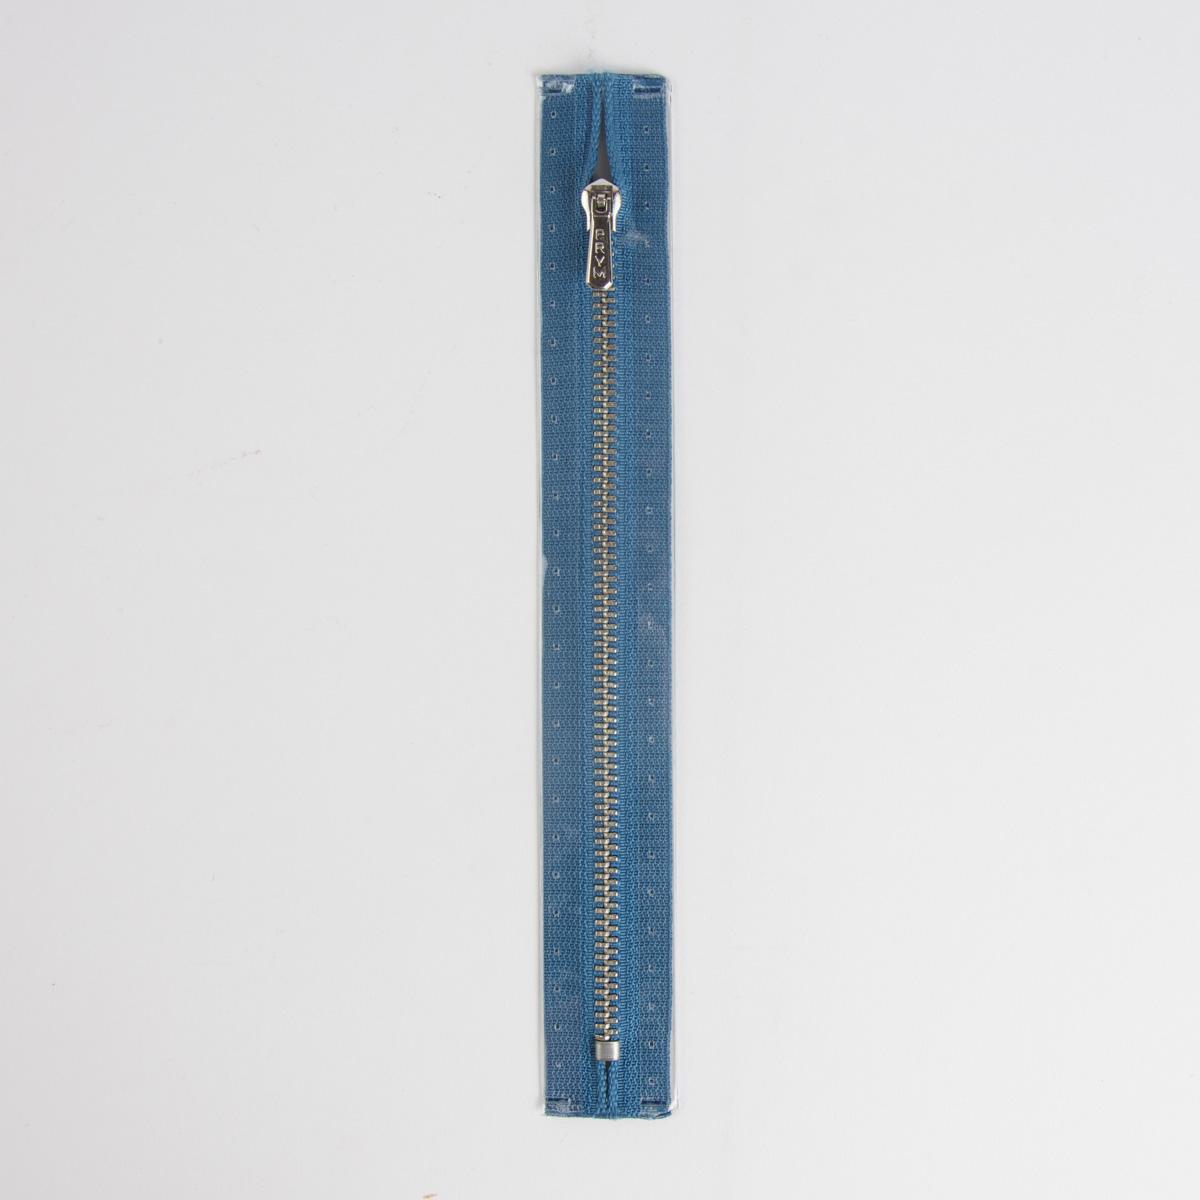 Prym Reißverschluss Metall Col. 235 blau 12cm